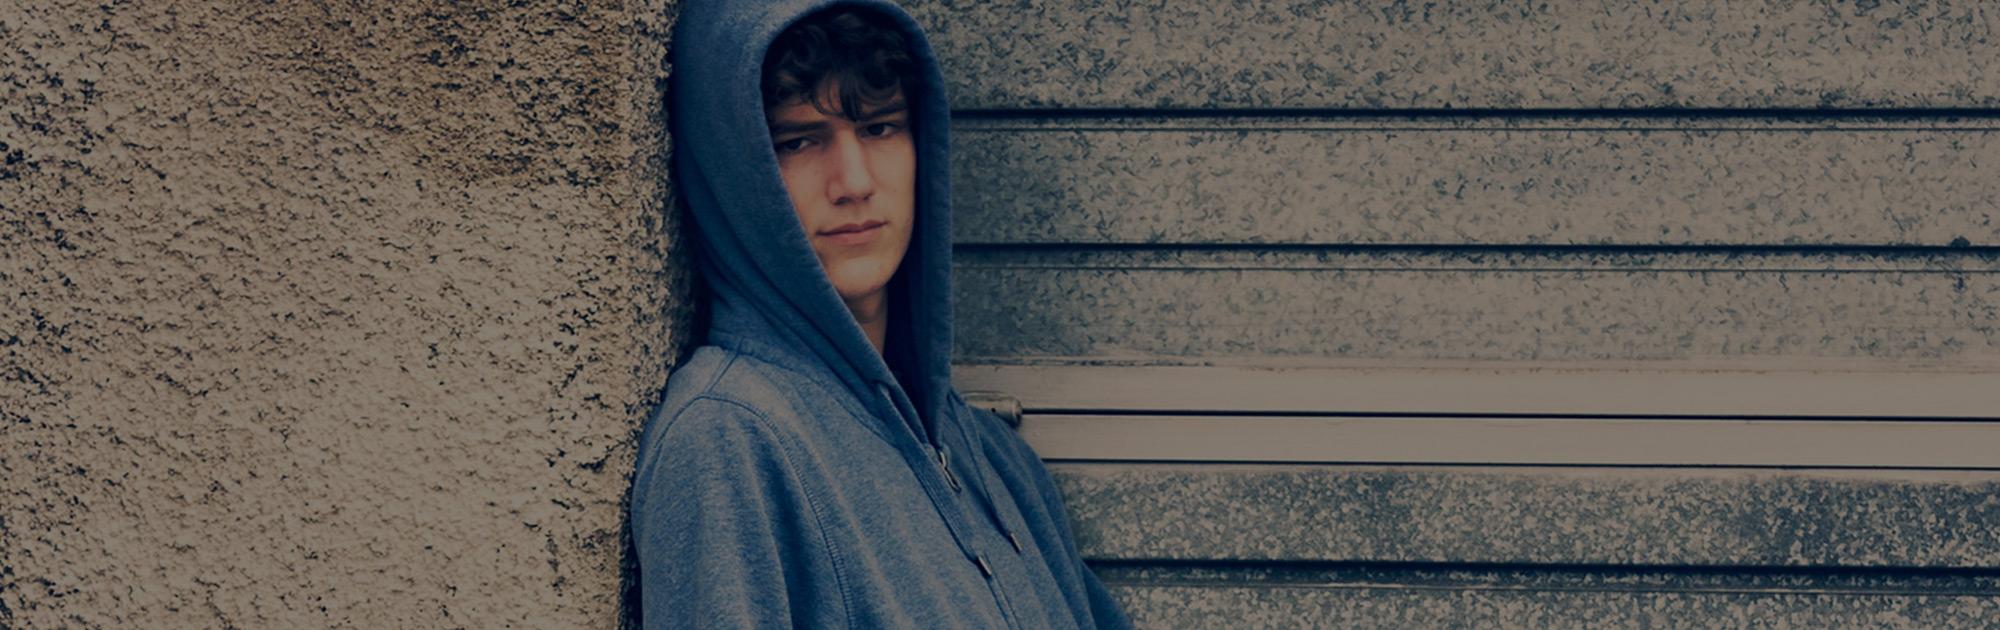 Psicoterapia para adolescentes